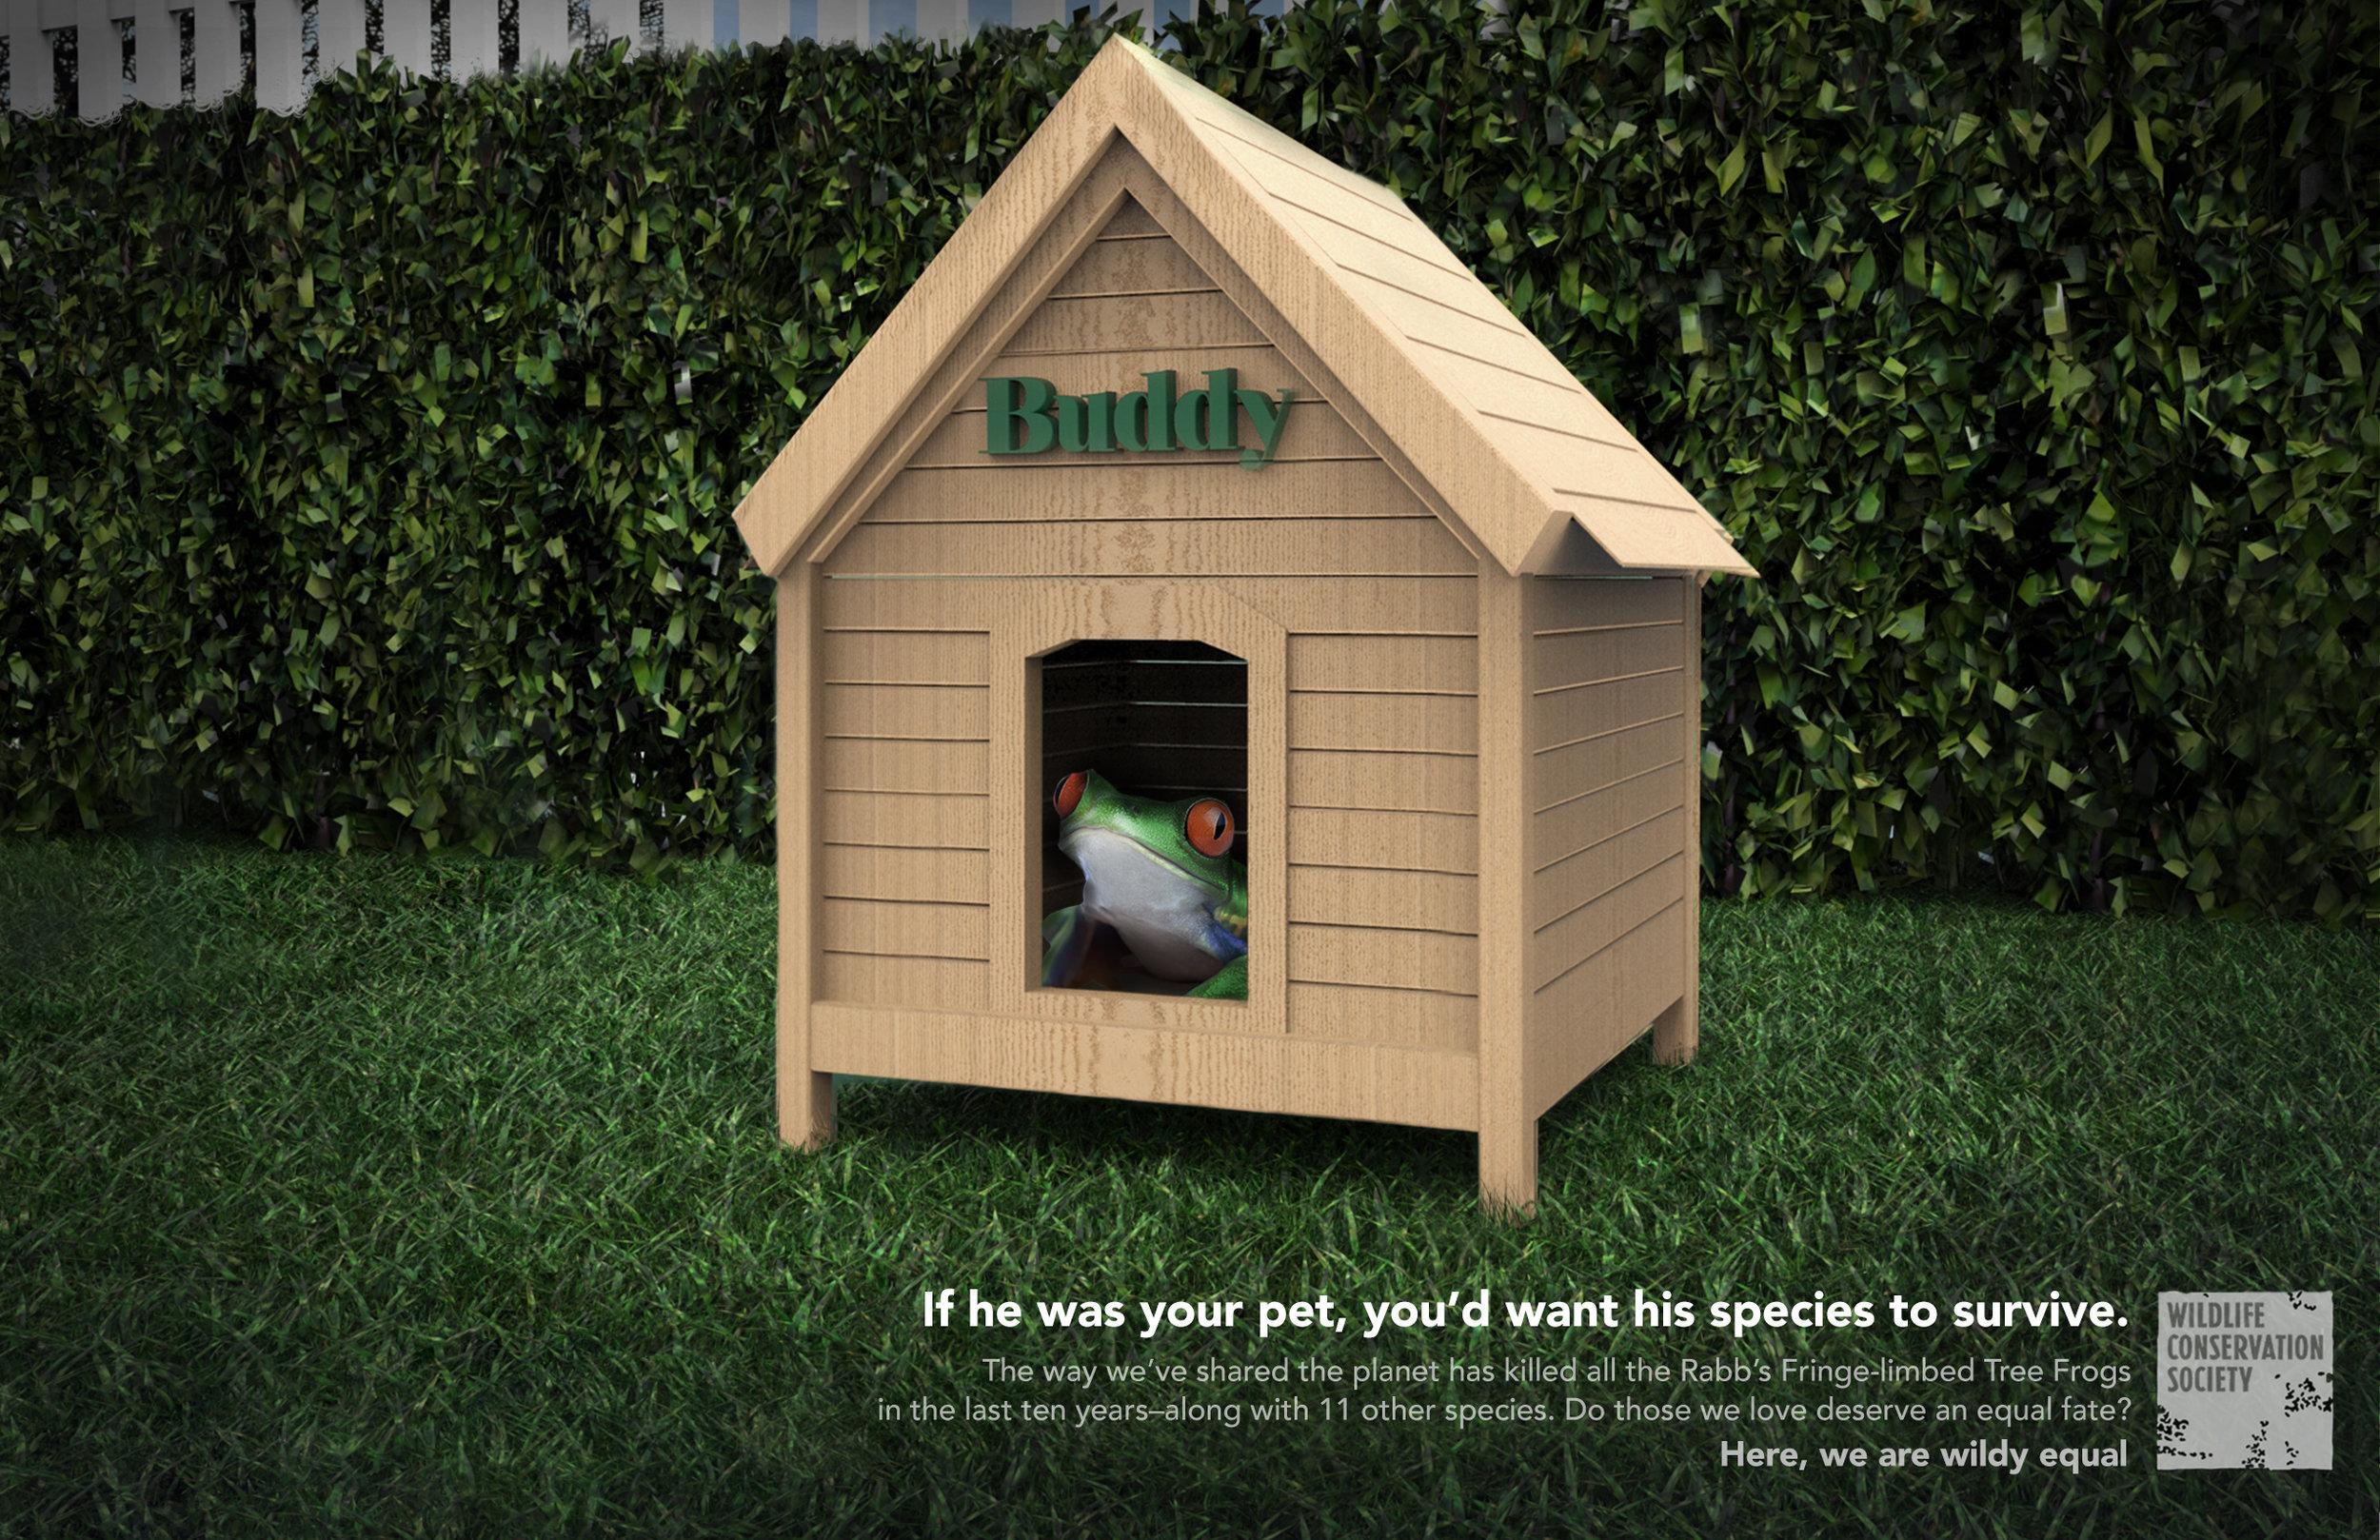 Wildlife Conservation Society Print Ad - Buddy